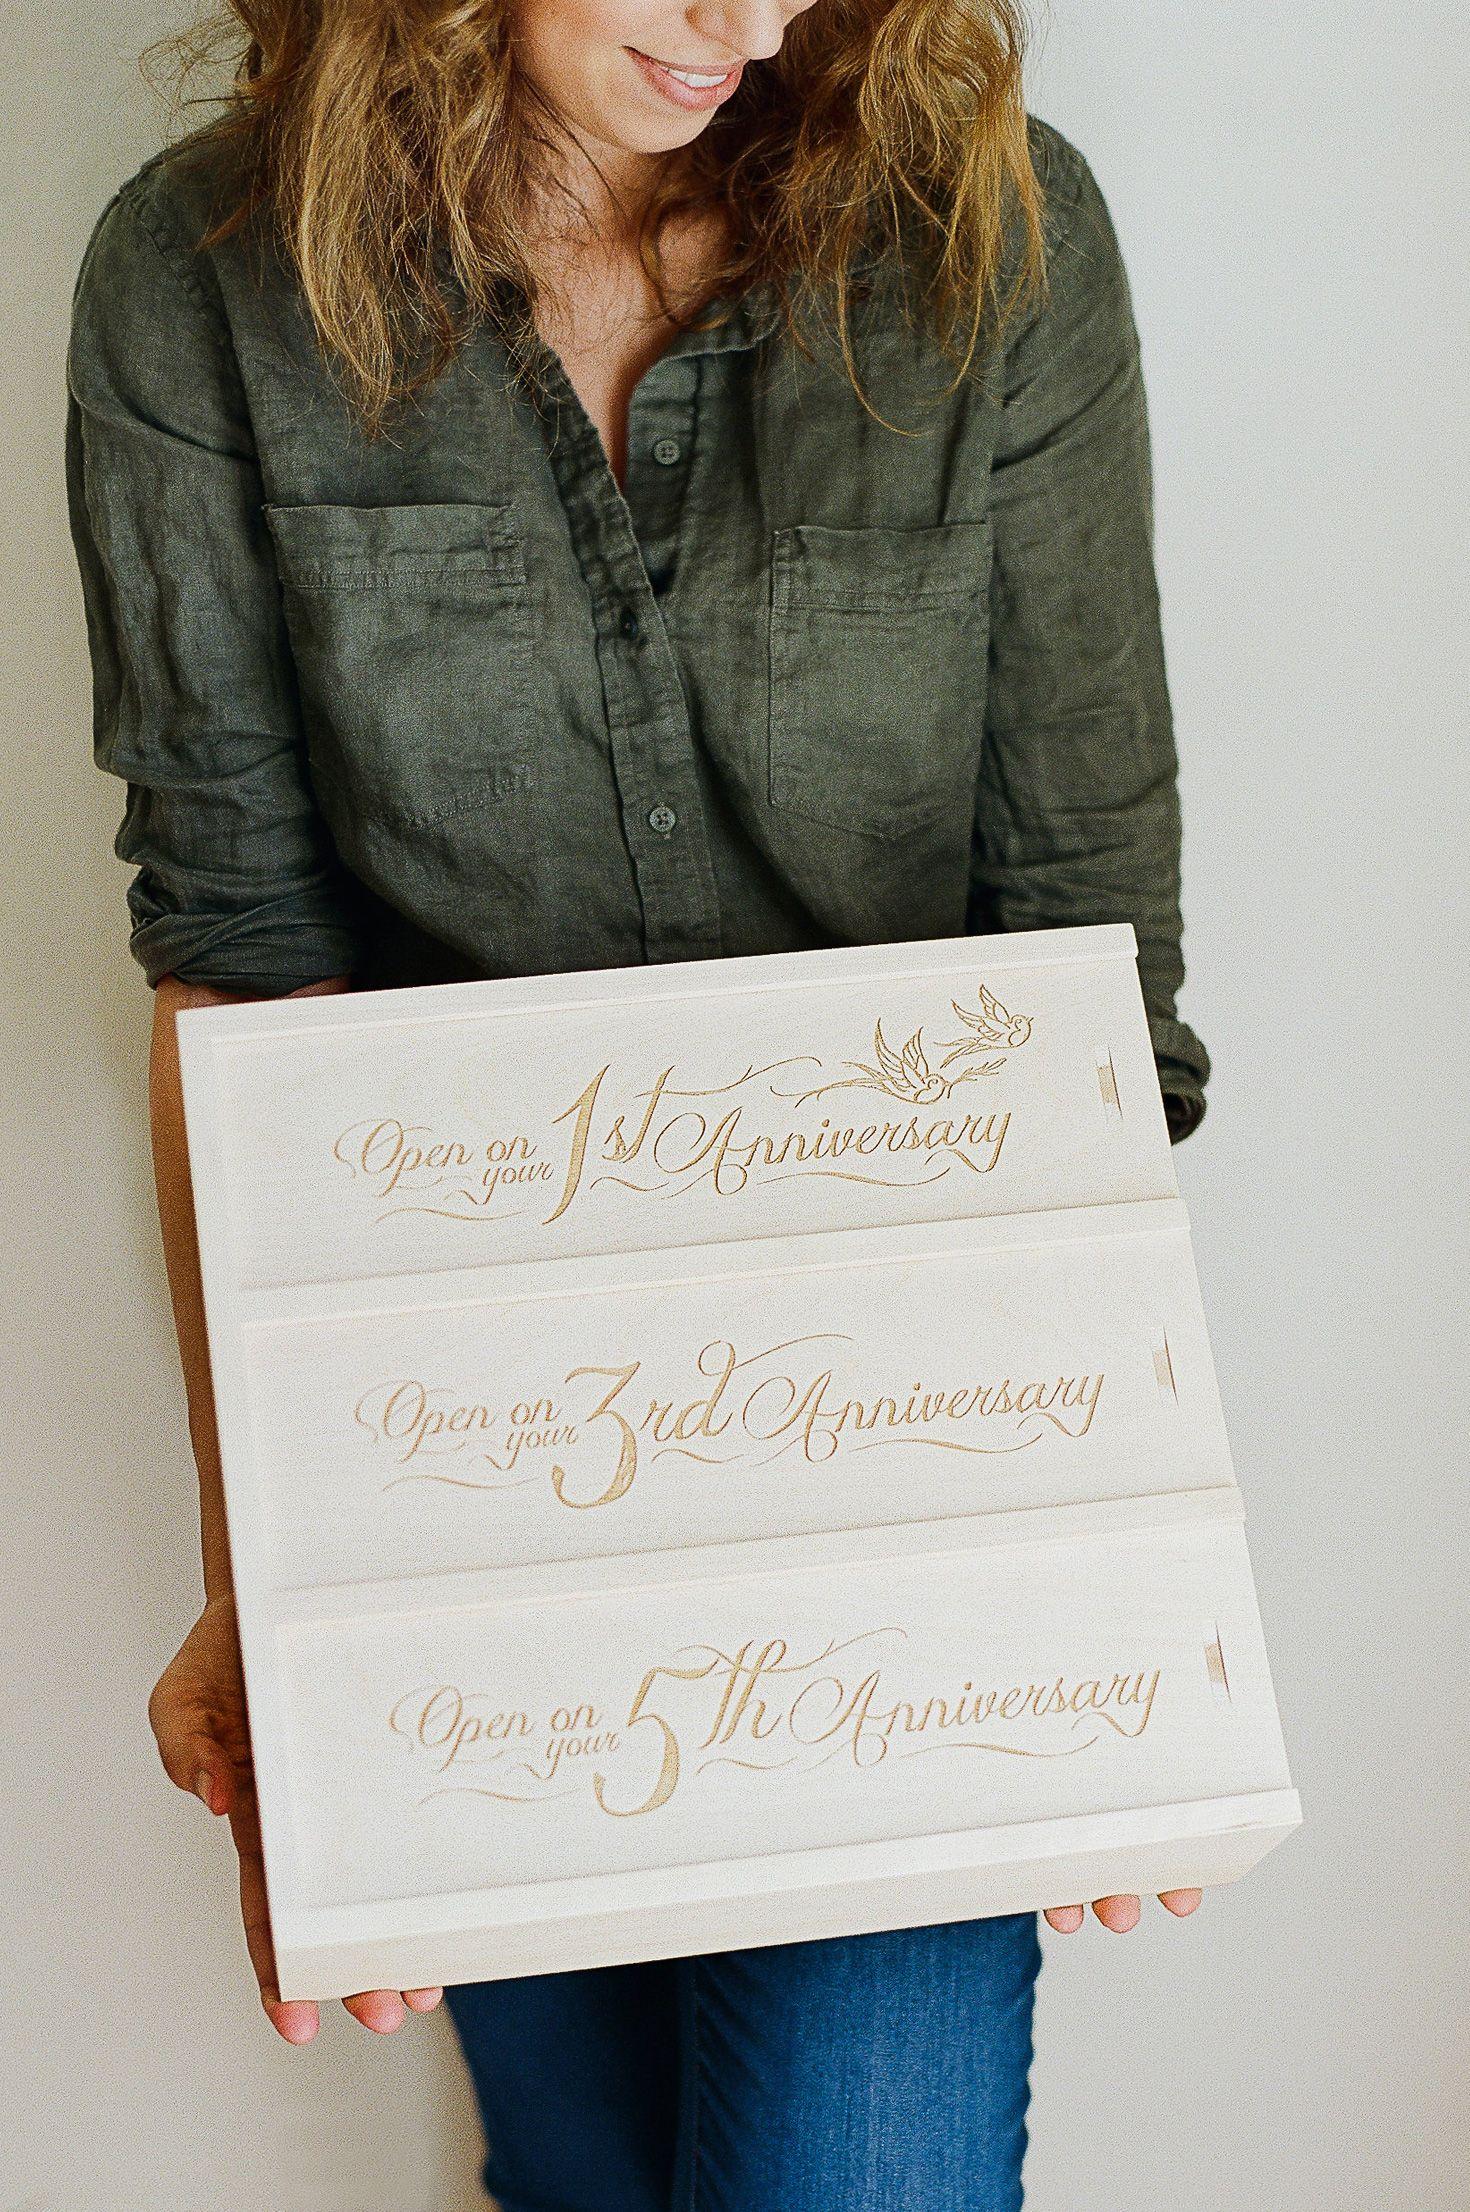 Dorable Wood Wedding Anniversary Gifts Pattern - Wedding Idea 2018 ...